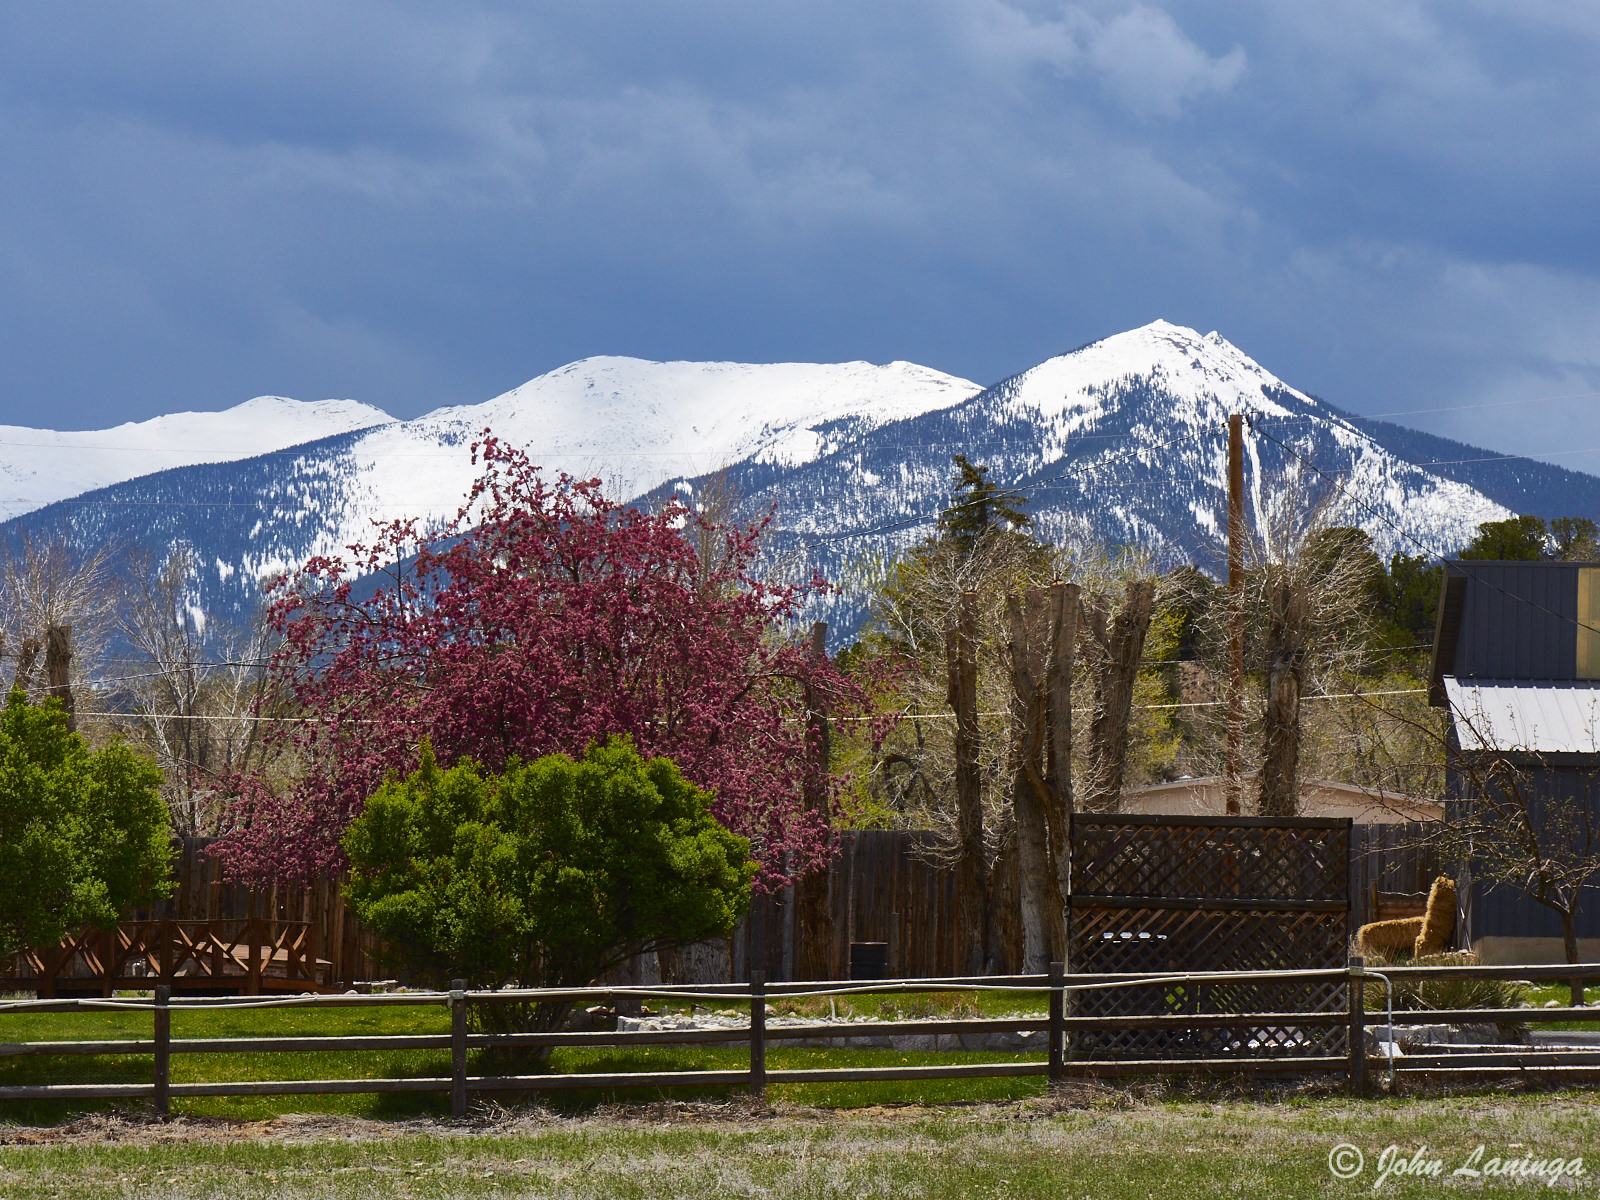 A ranch, acroos